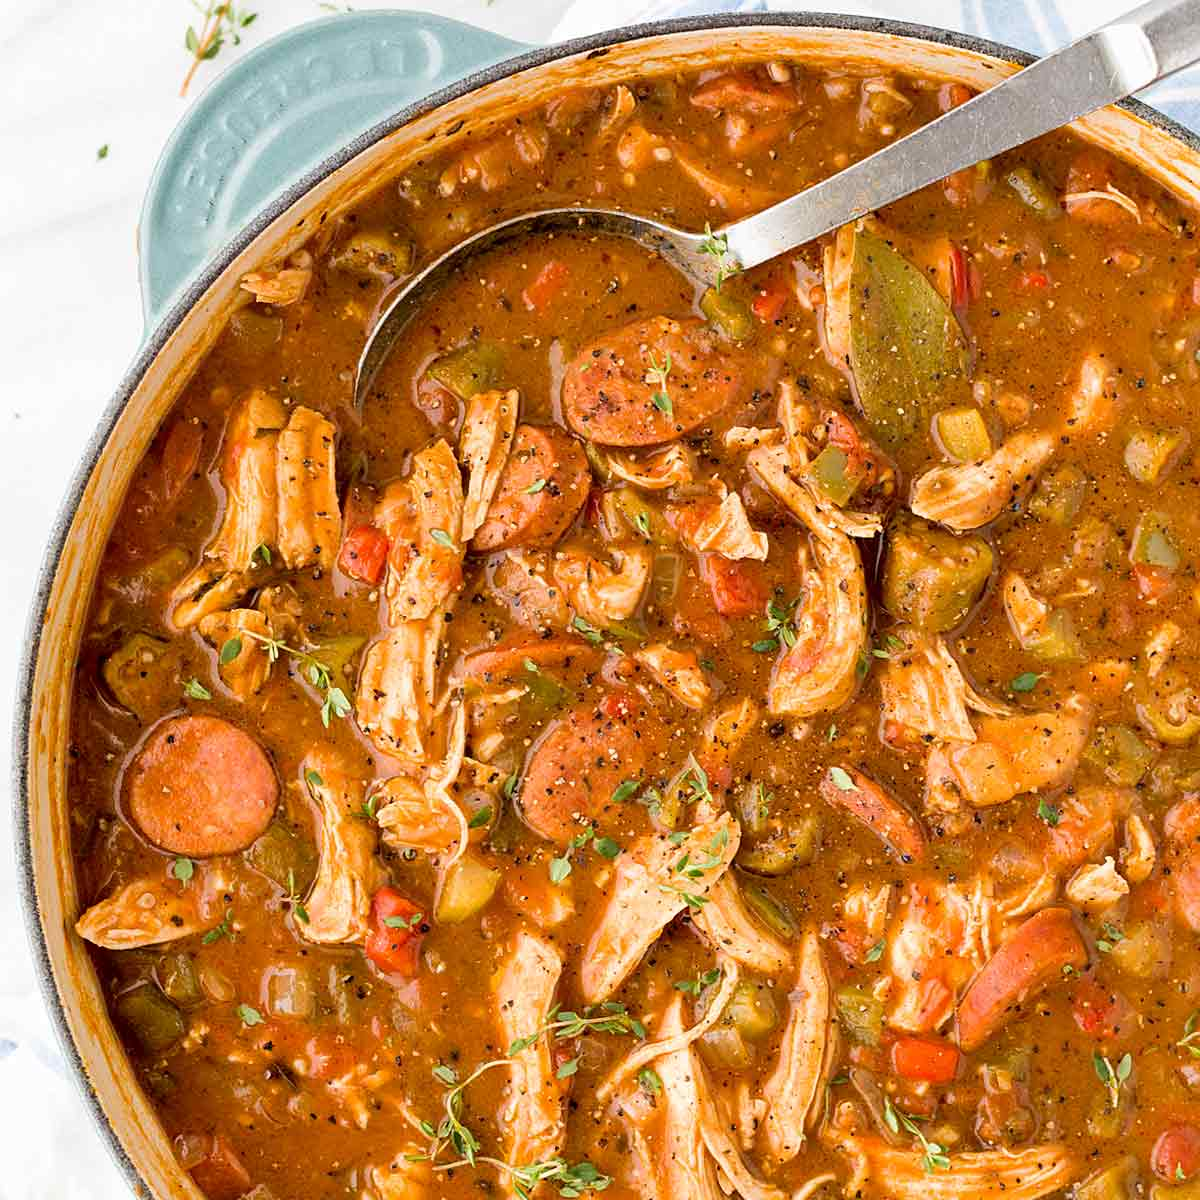 New Orleans Chicken Andouille Sausage Gumbo | Jessica Gavin